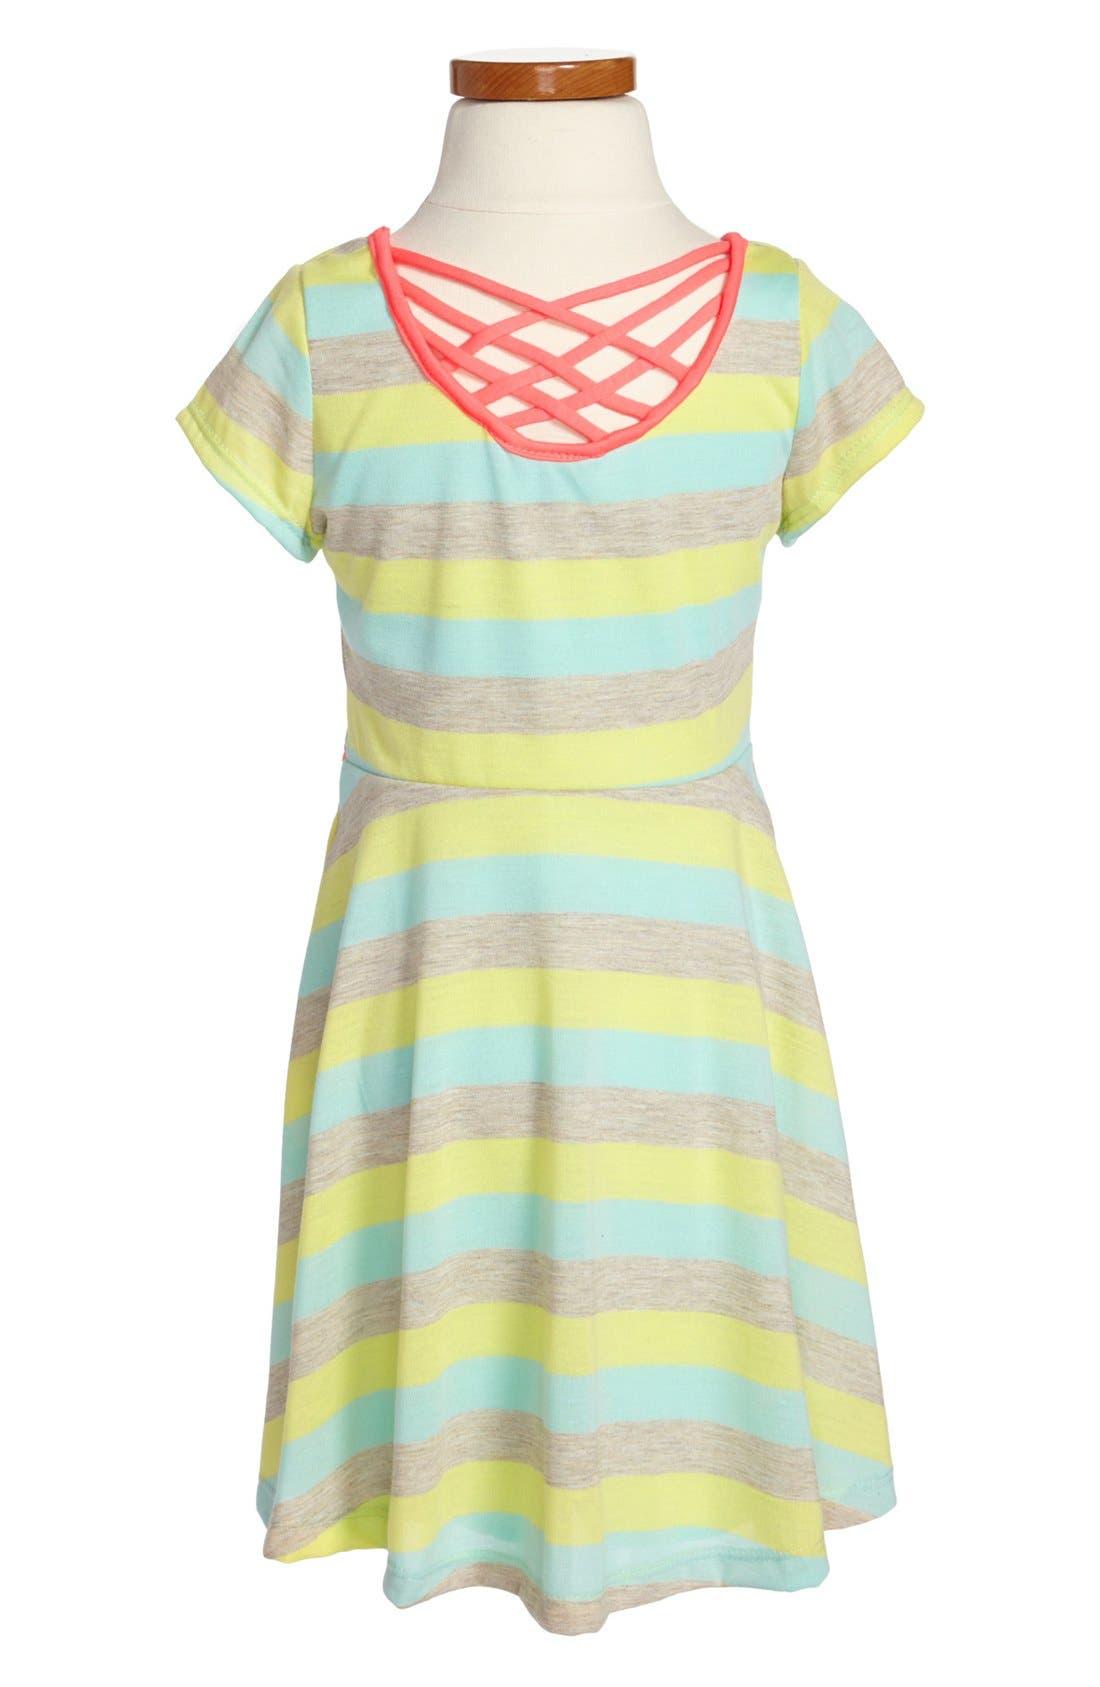 Alternate Image 2  - Zunie Stripe Skater Dress (Little Girls & Big Girls)